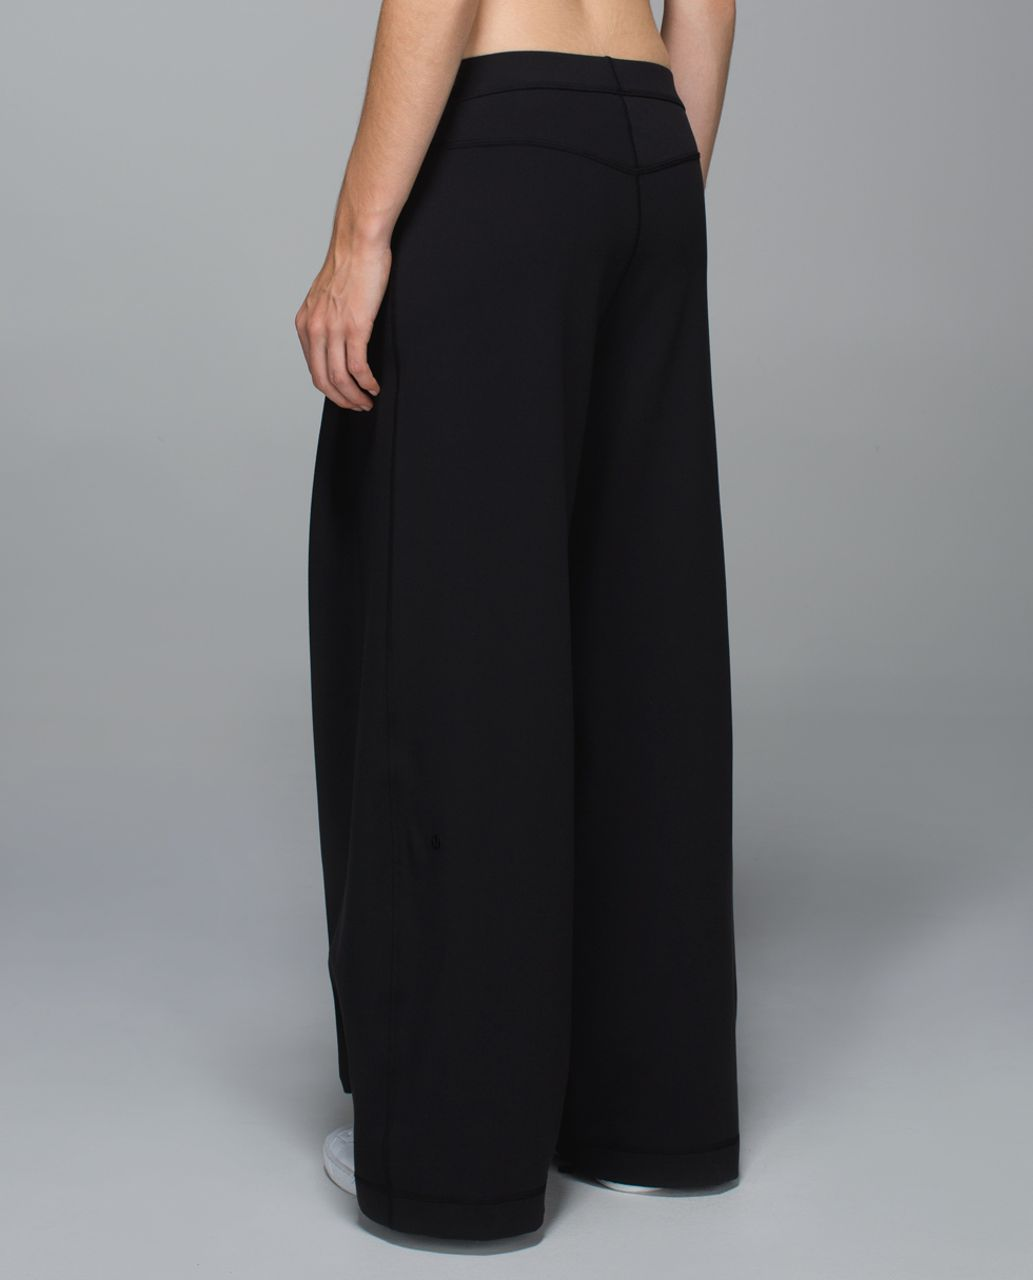 4253bb355 Lululemon Forward Fold Trouser  Full-On Luon - Black - lulu fanatics